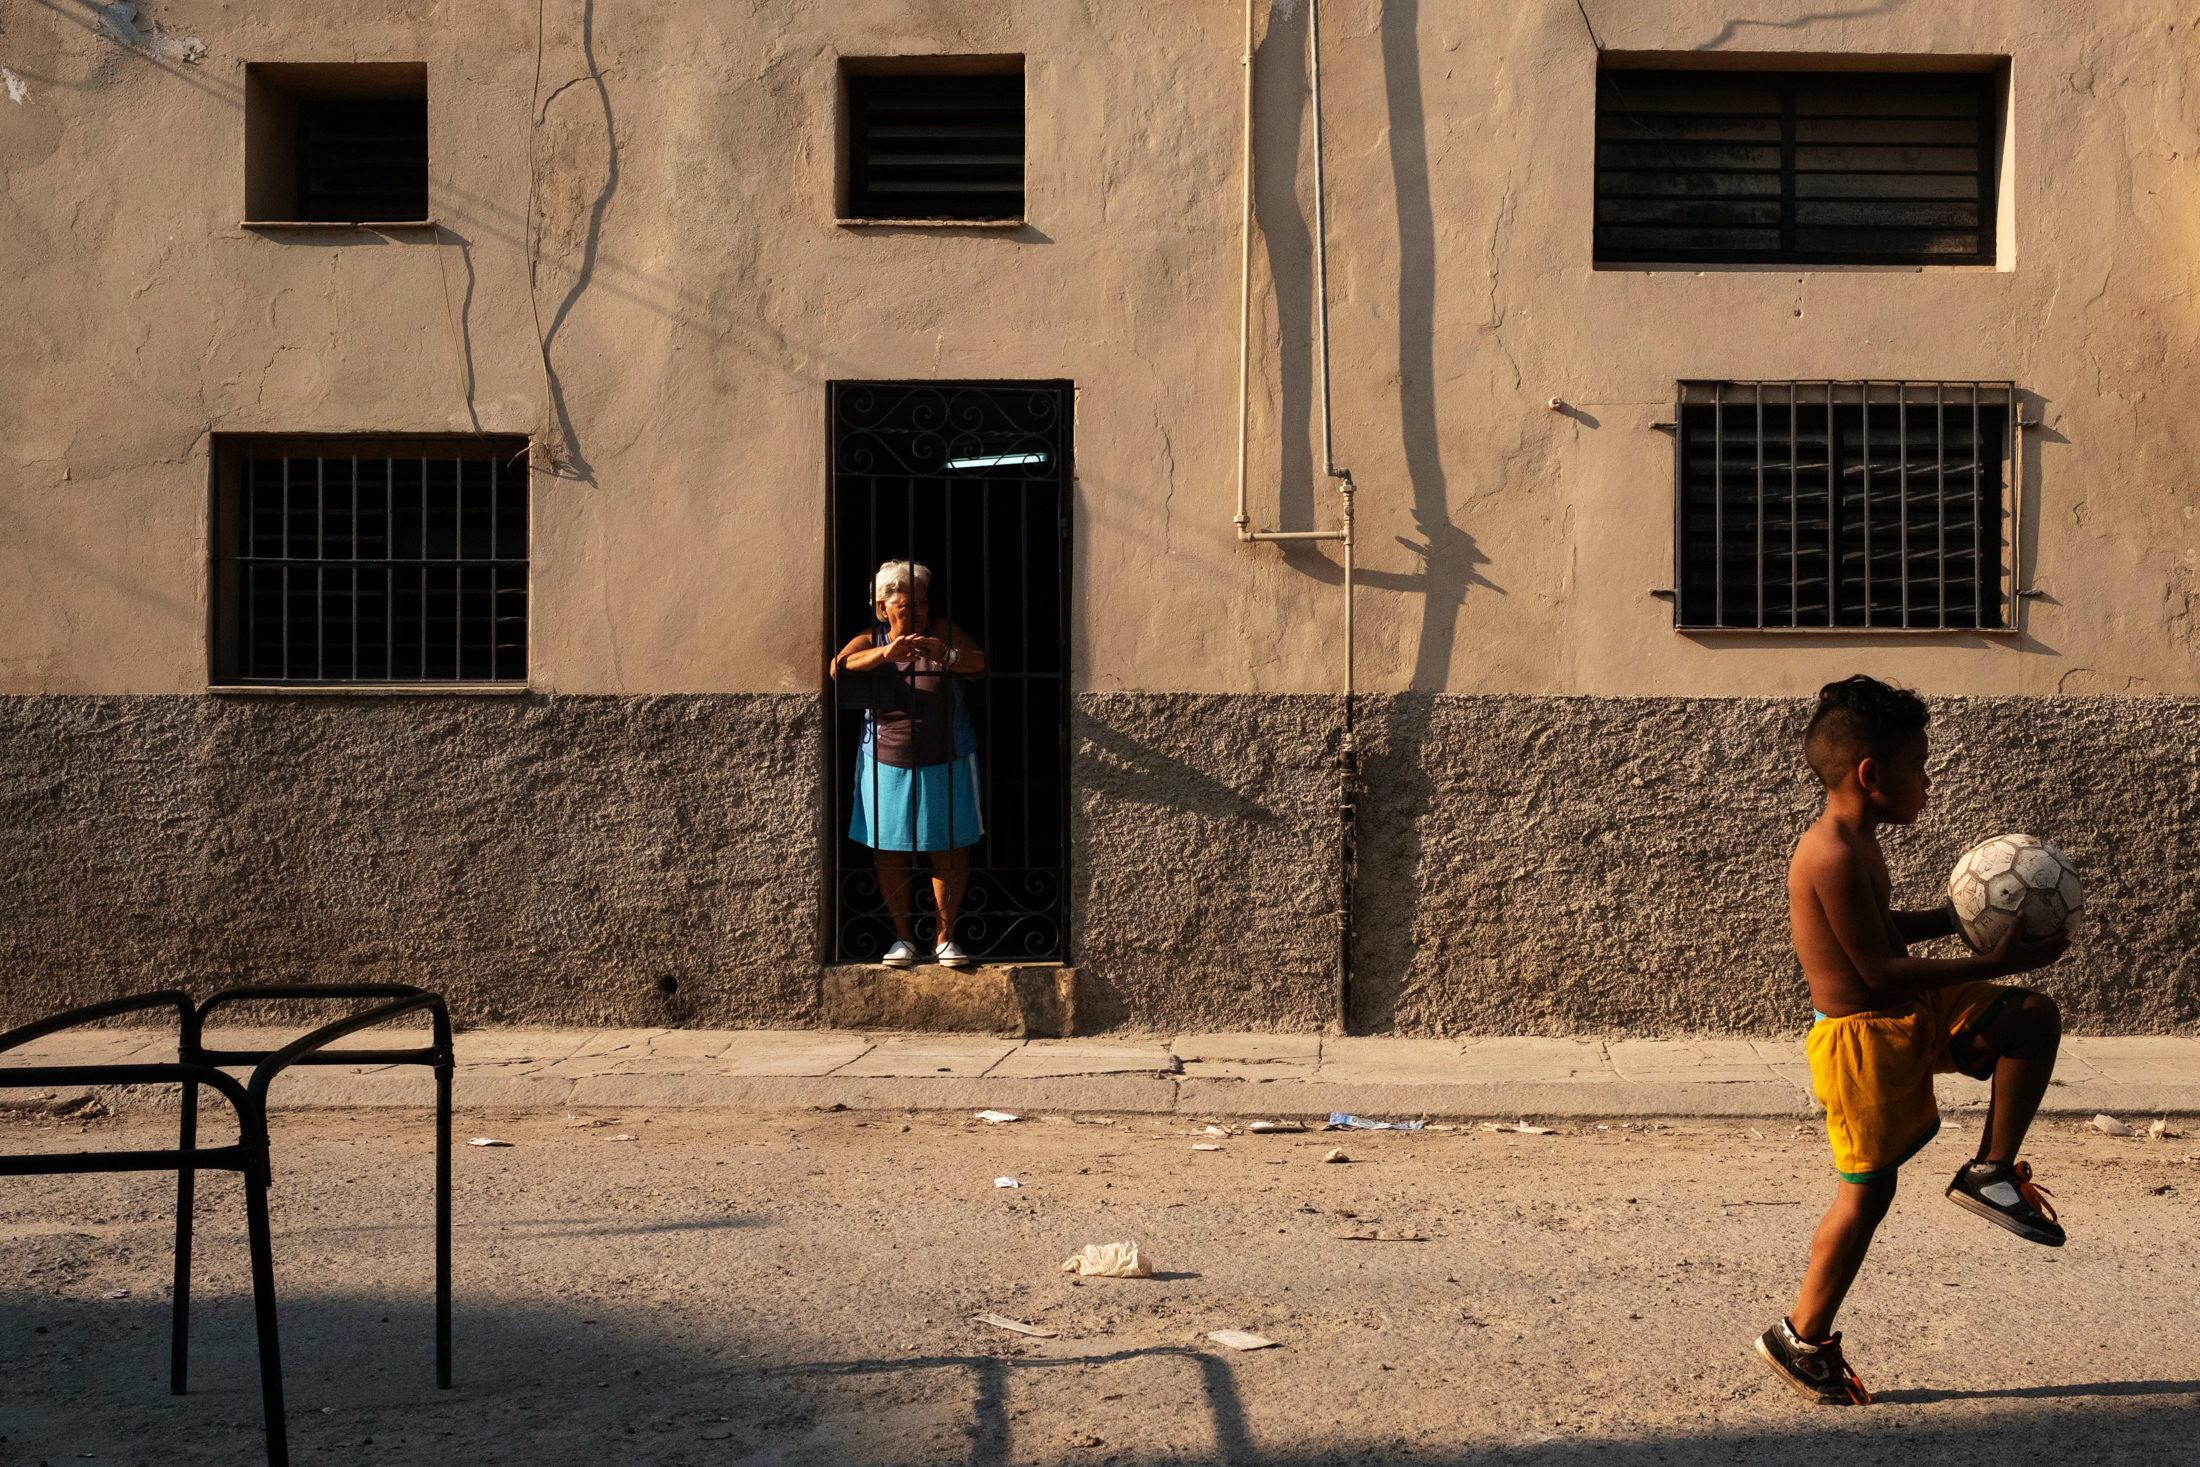 little boy balancing a football in Cuba, Havana